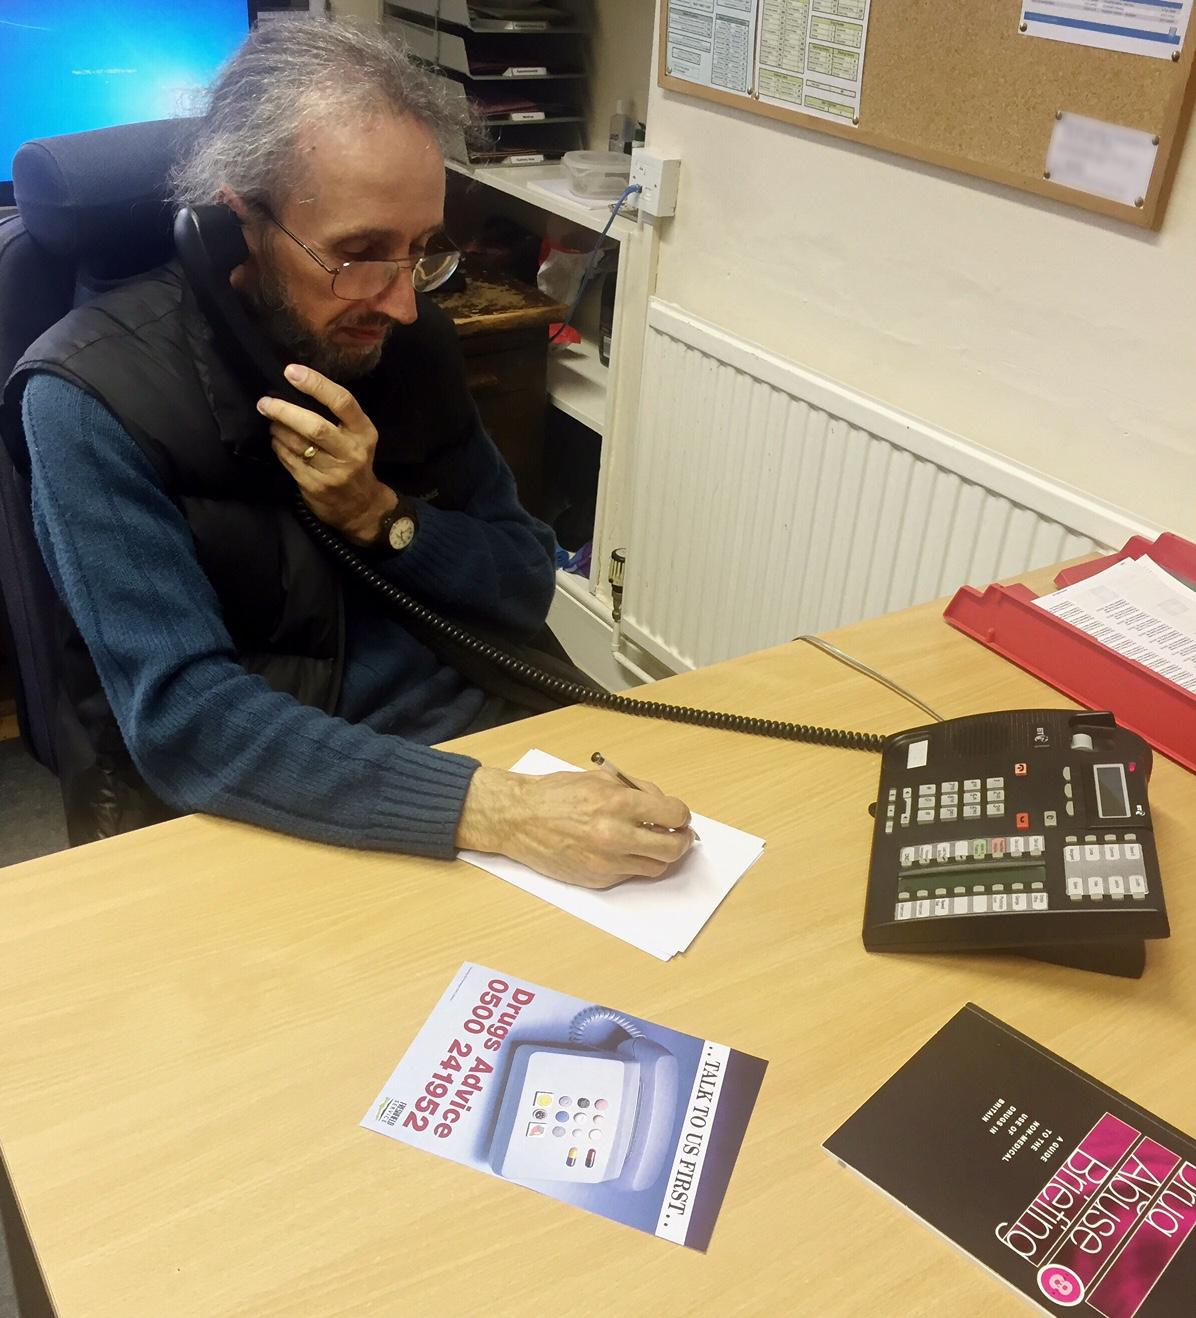 St Petroc's Society Freshfield Telephone Helpline